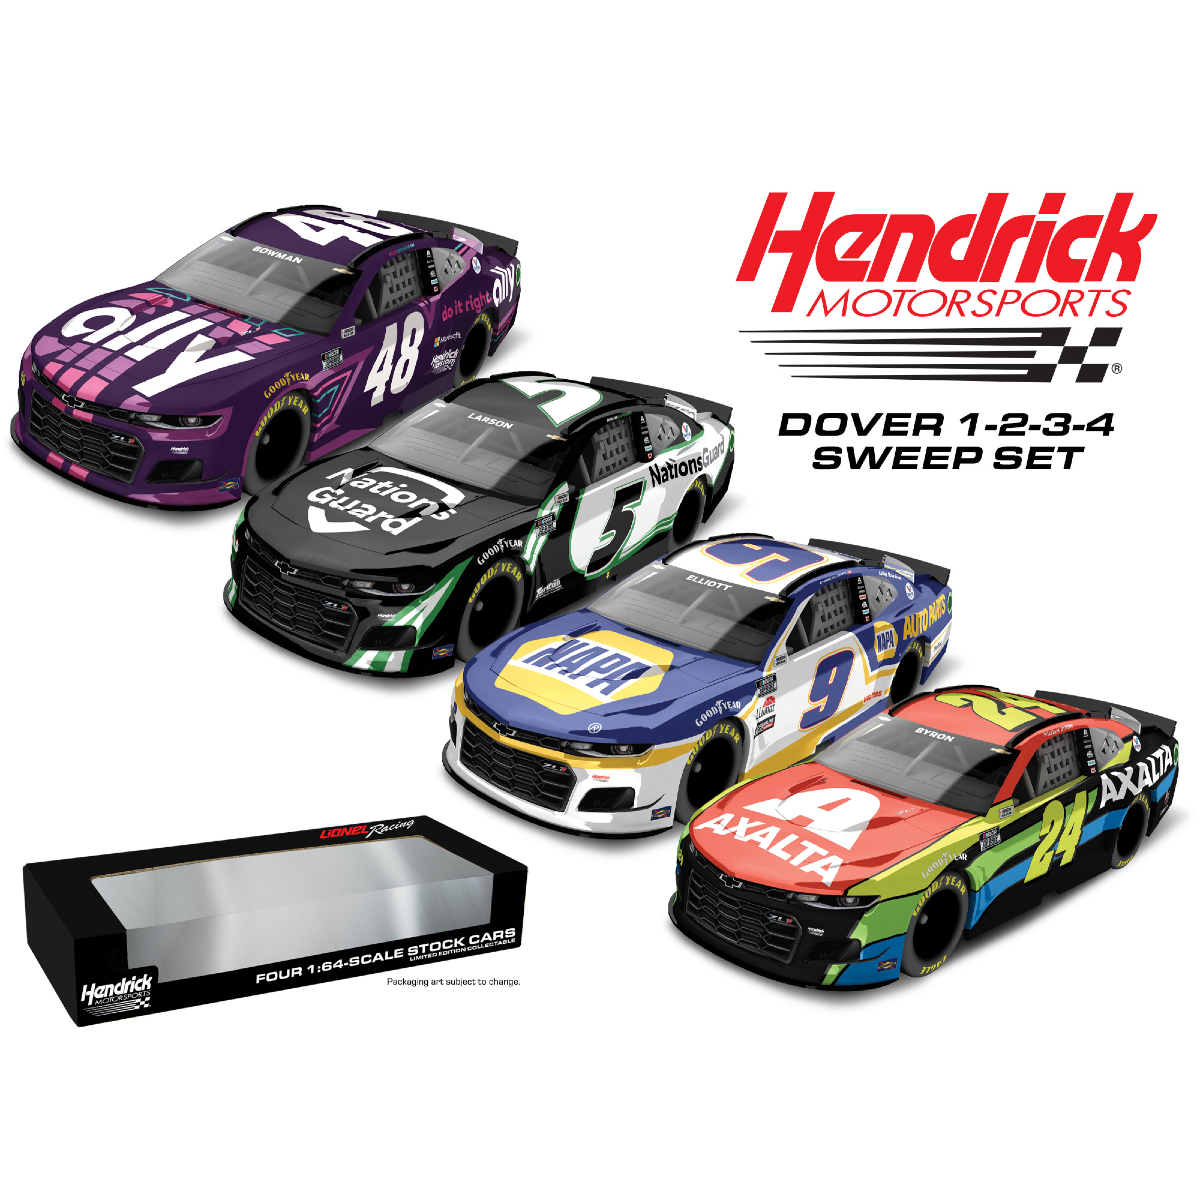 Hendrick Motorsports 2021 Dover Top 4 Sweep Set 1:64 Scale Die-Casts